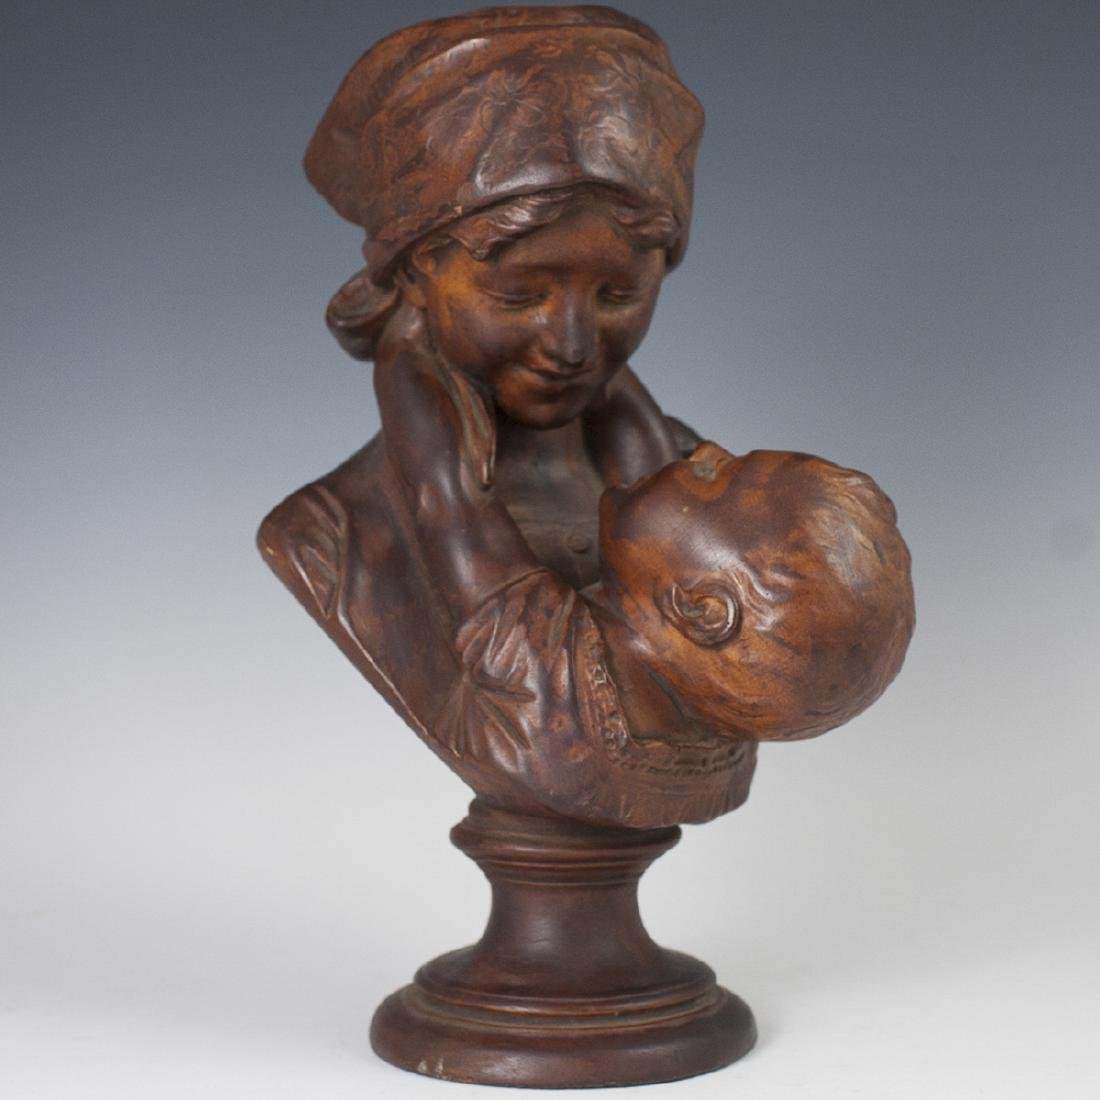 Antique Carved Wooden Bust